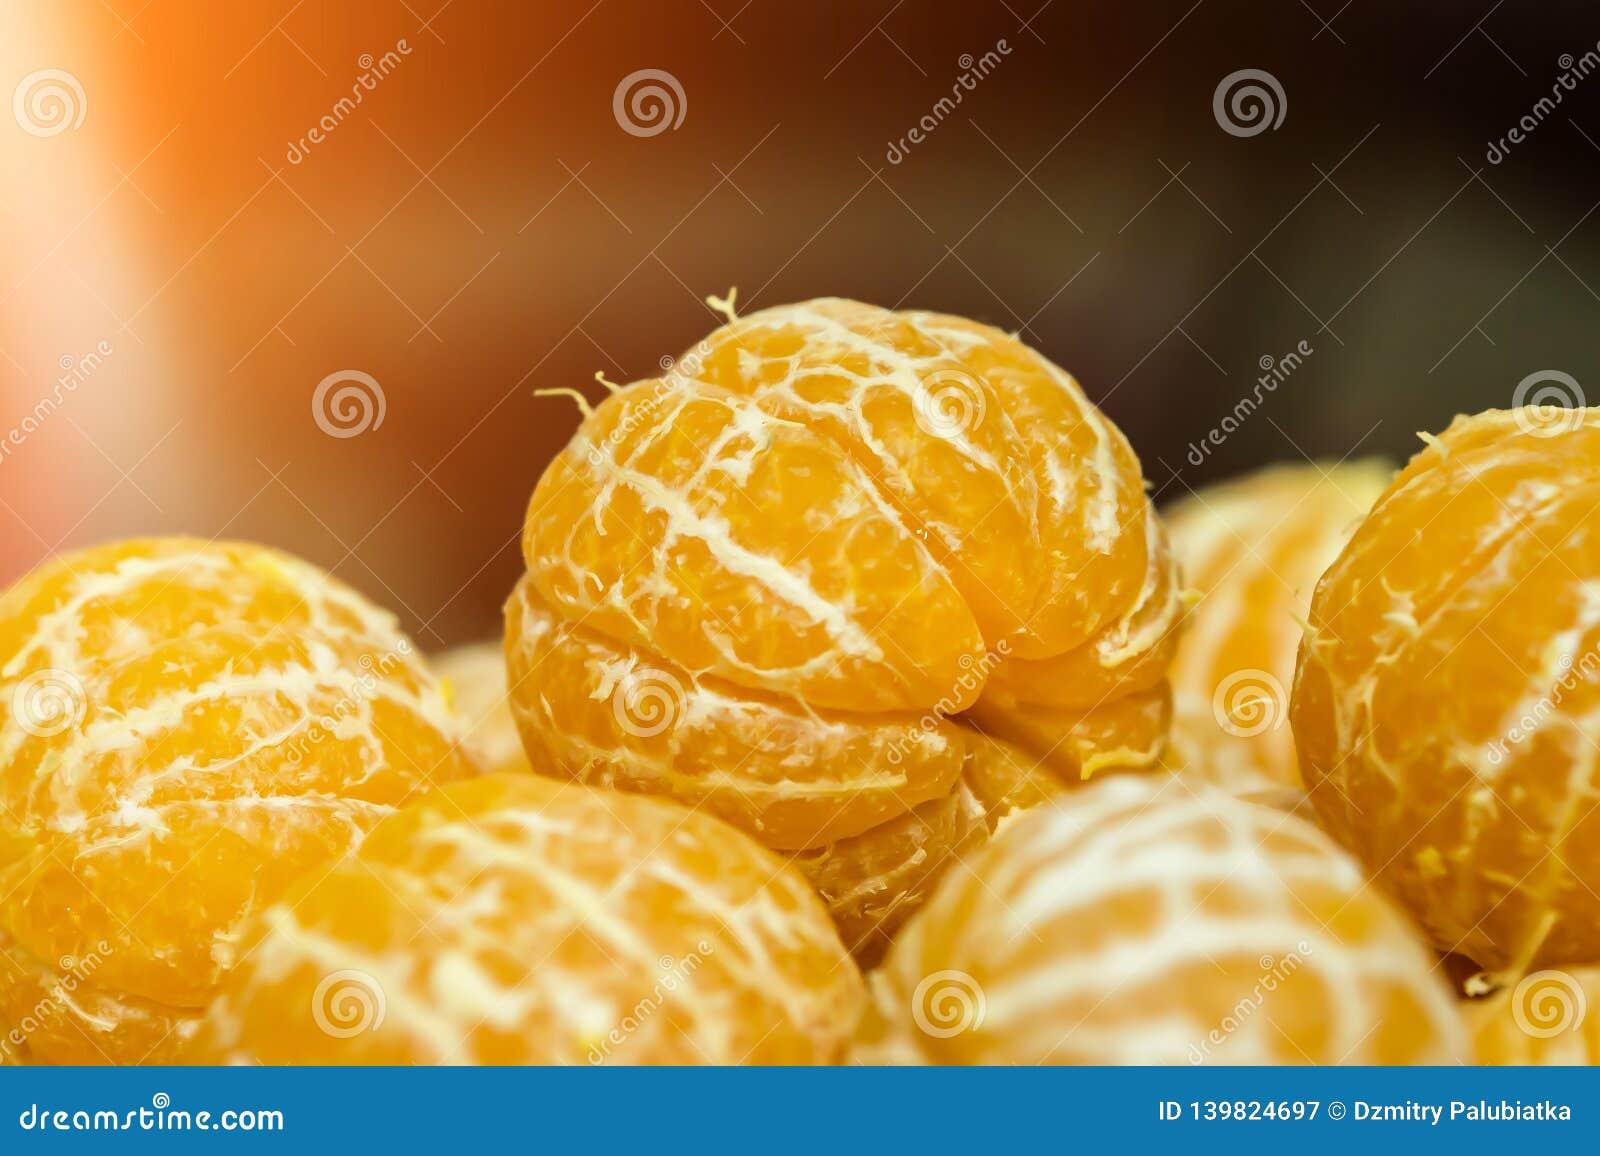 Tangerines χωρίς φλούδα